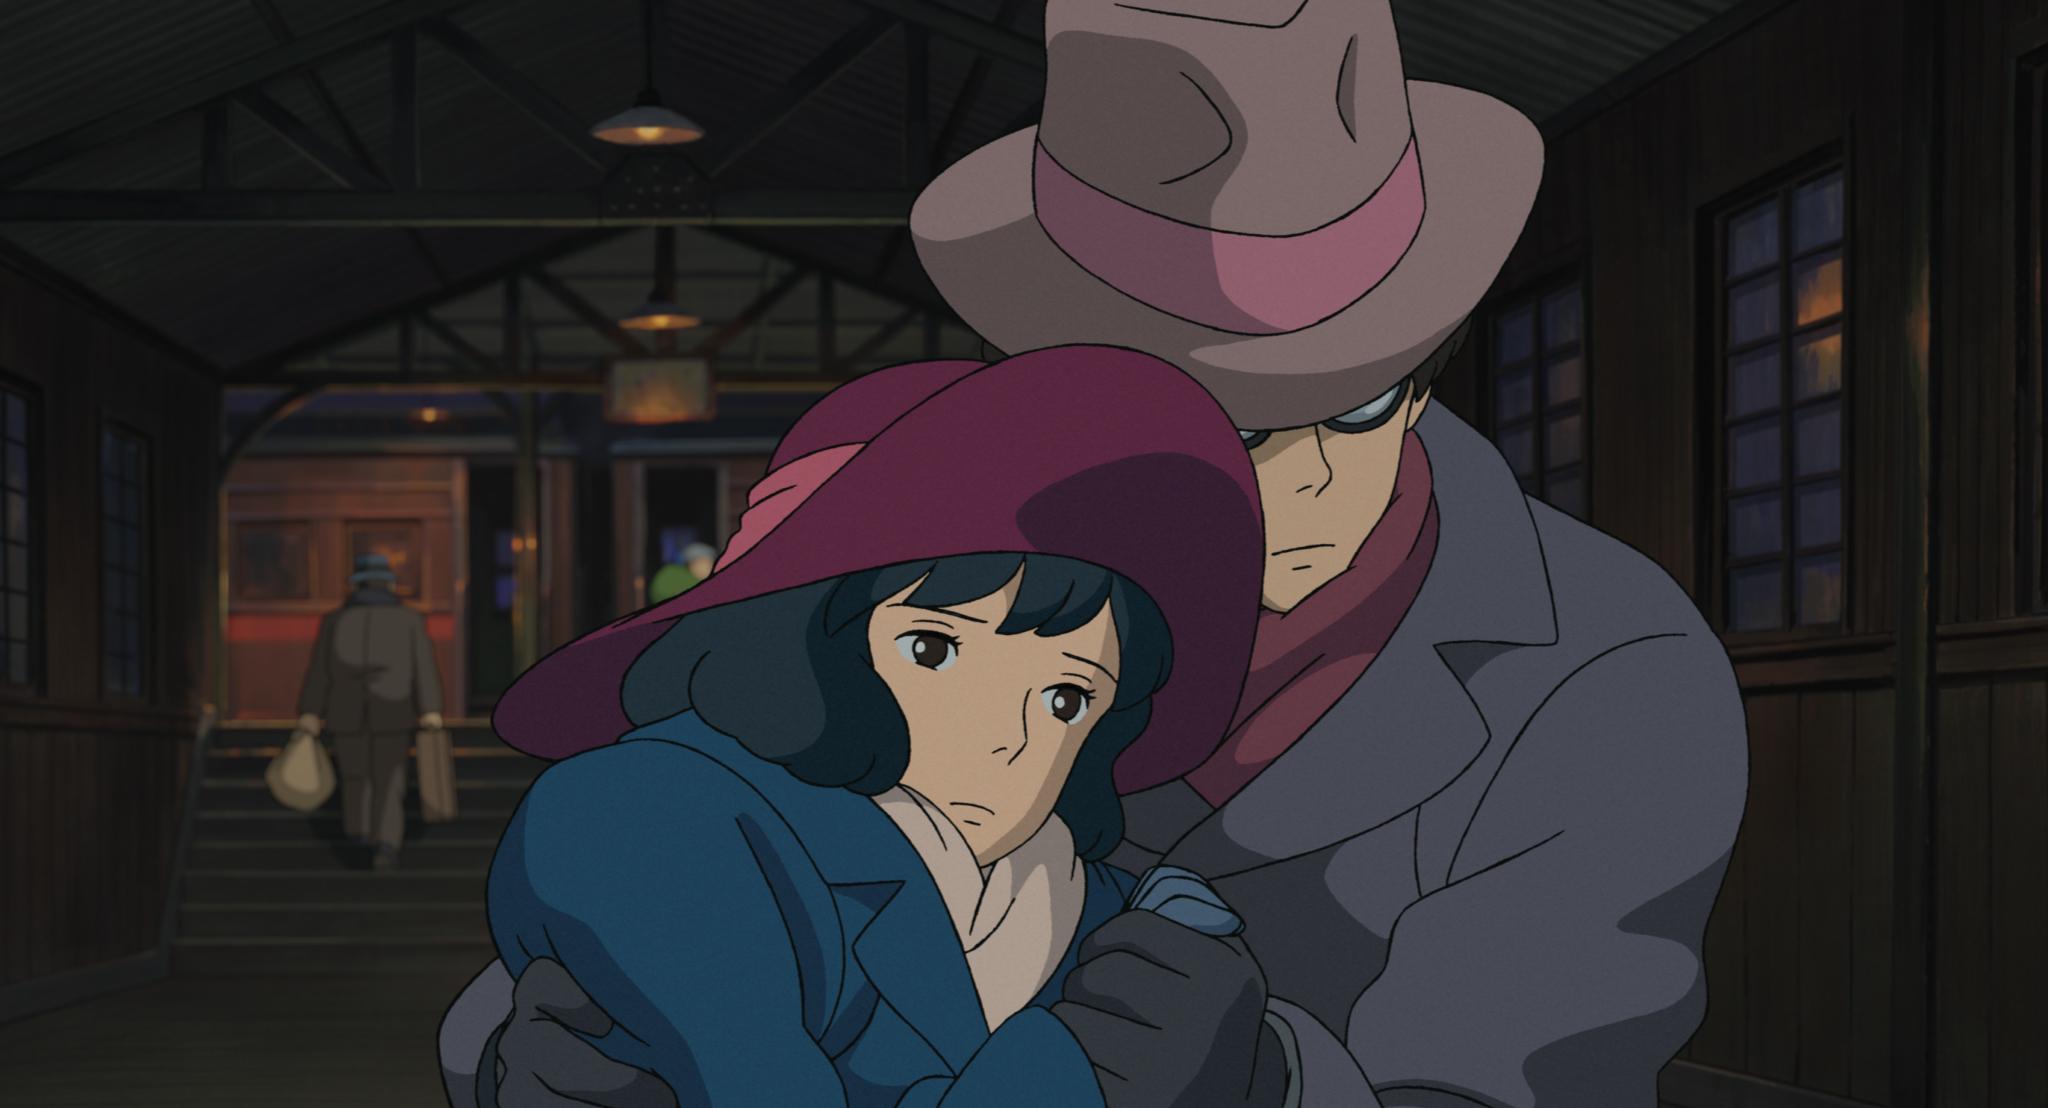 Anime_The_wind_rises_Miyazaki_anime_cartoon__characters_hugging_048495_.jpg